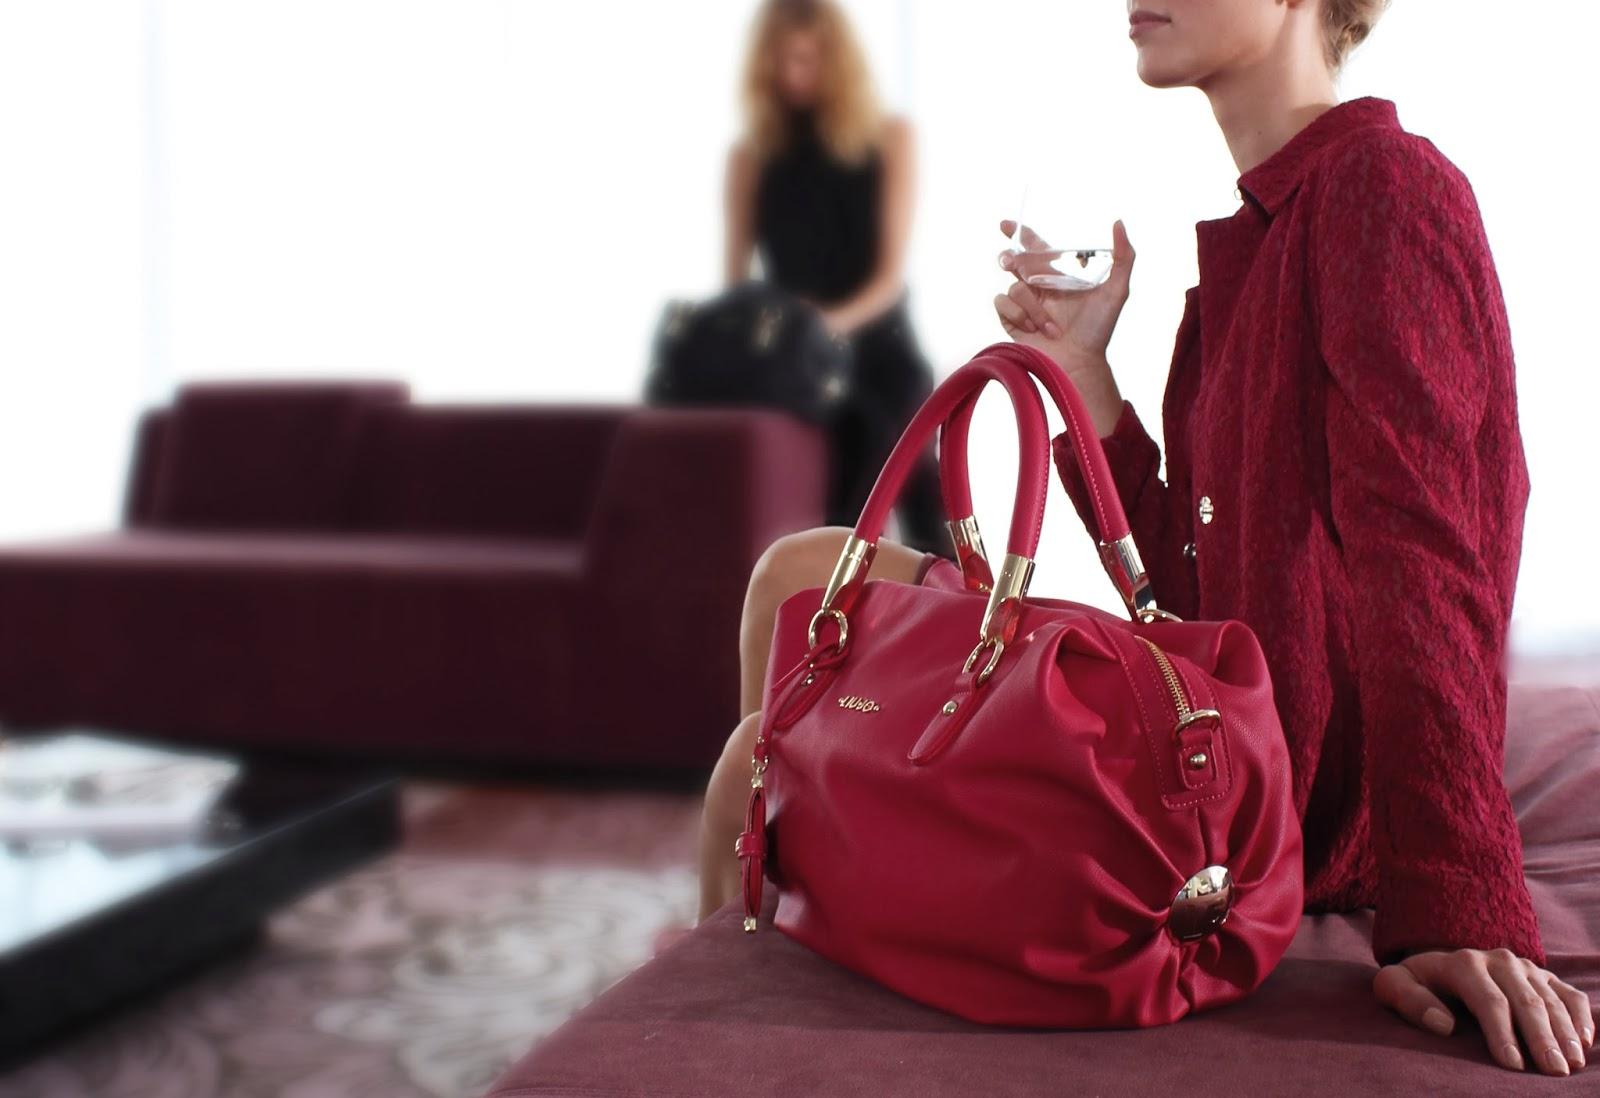 7ddf81fa16c09 Cherry Caipiroska  La Nuova It-Bag Liu Jo  Amélie - Come la vedi t ...